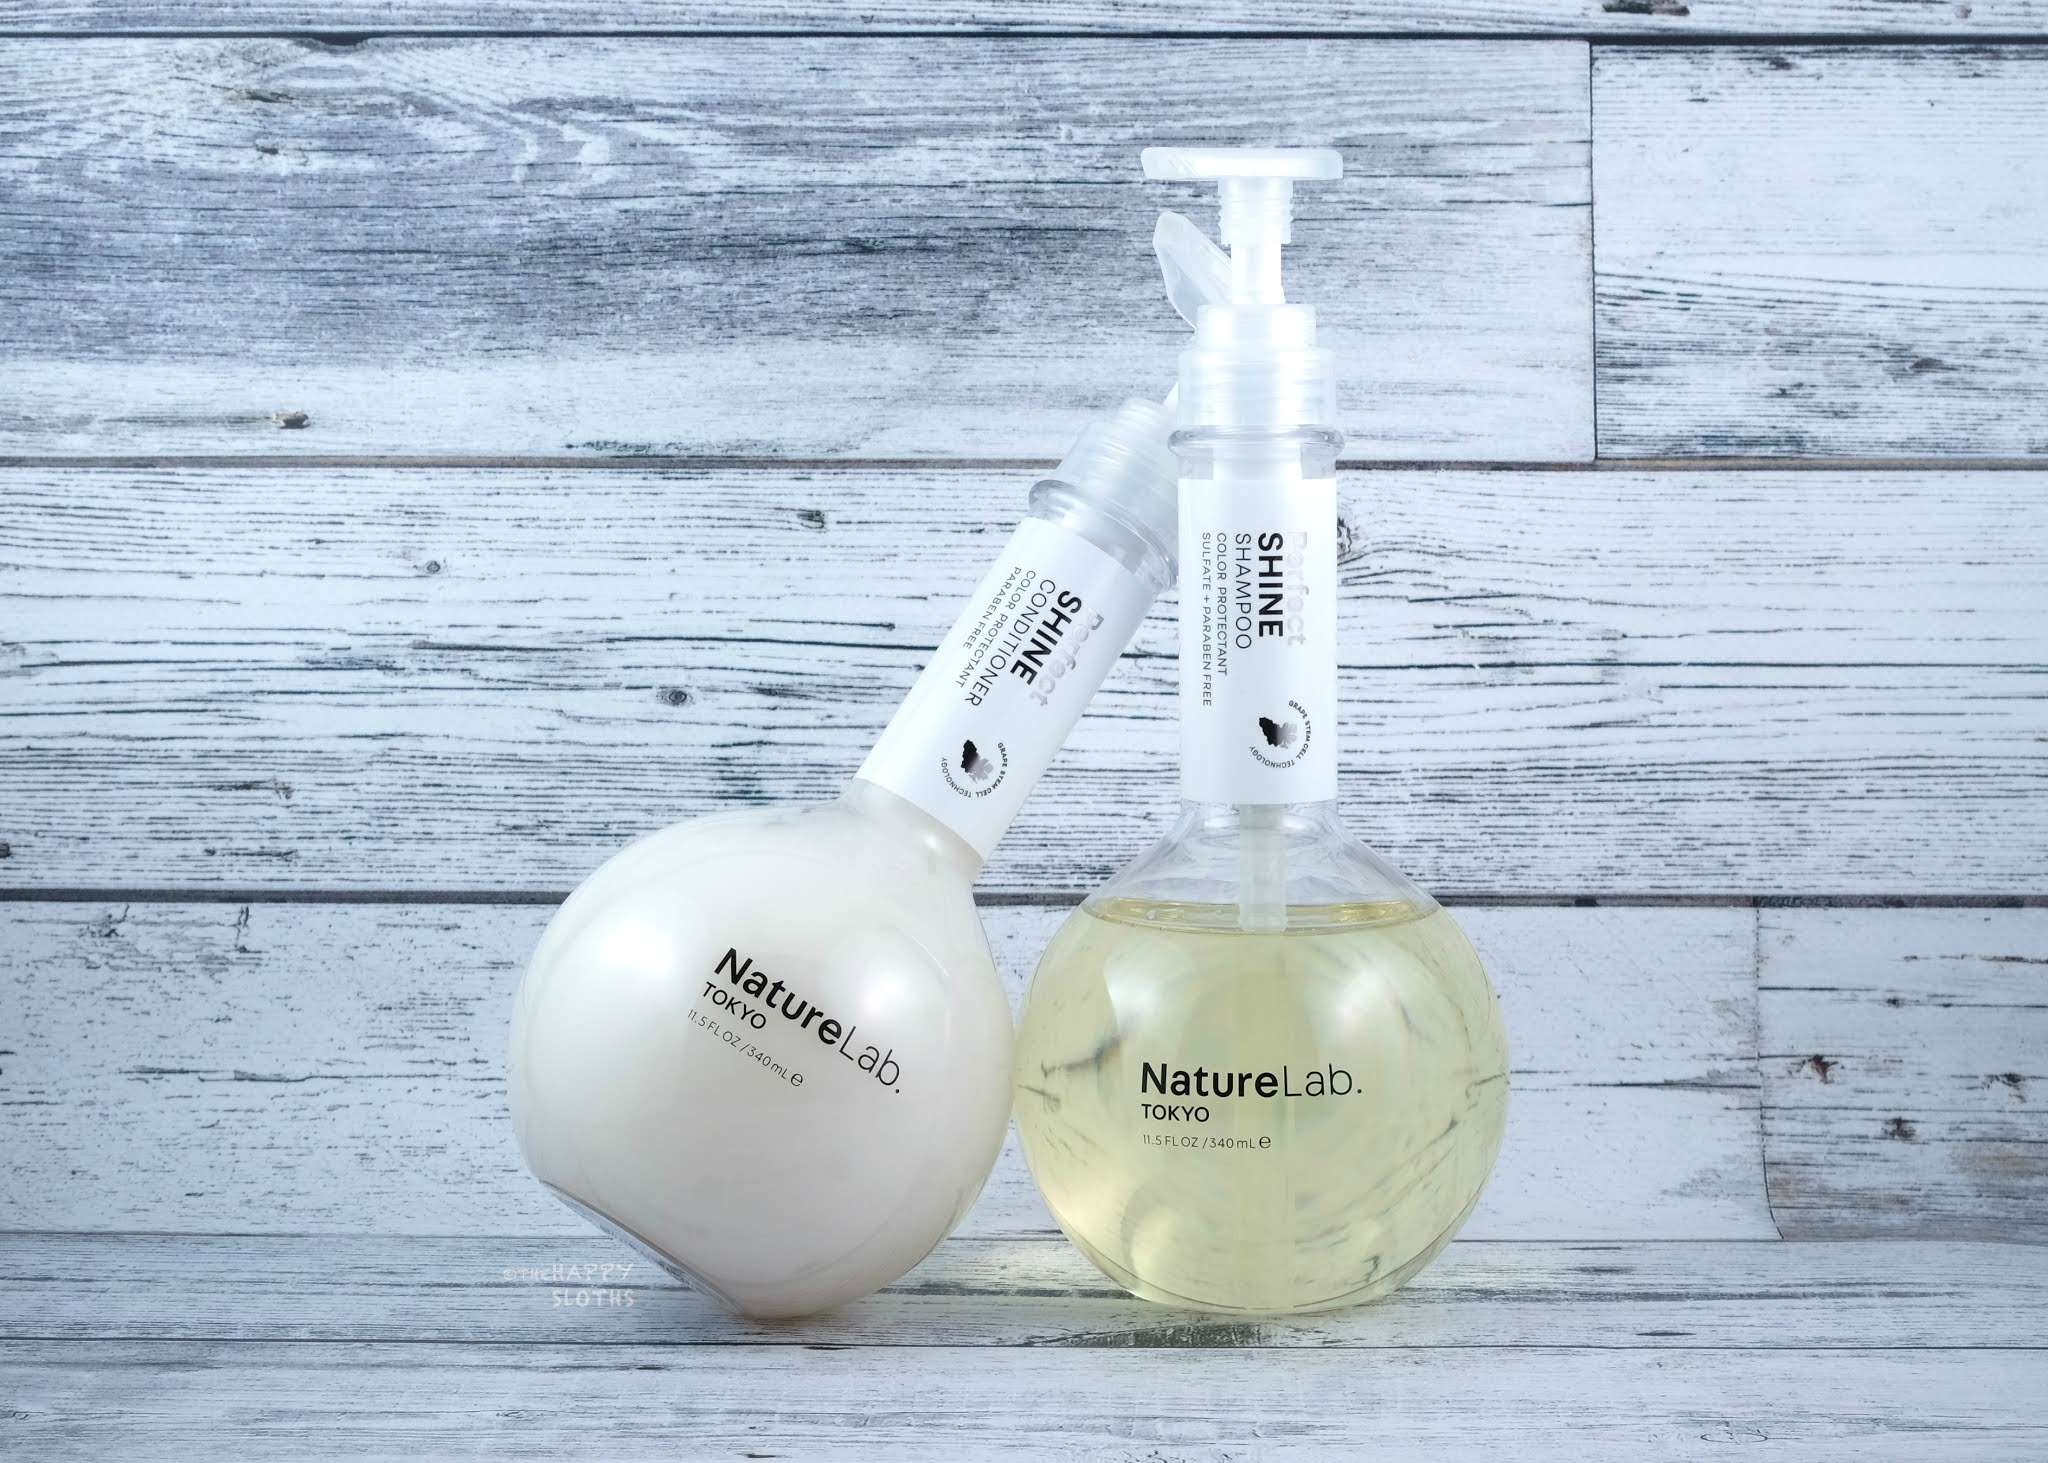 NatureLab. Tokyo | Perfect Shine Shampoo & Conditioner: Review